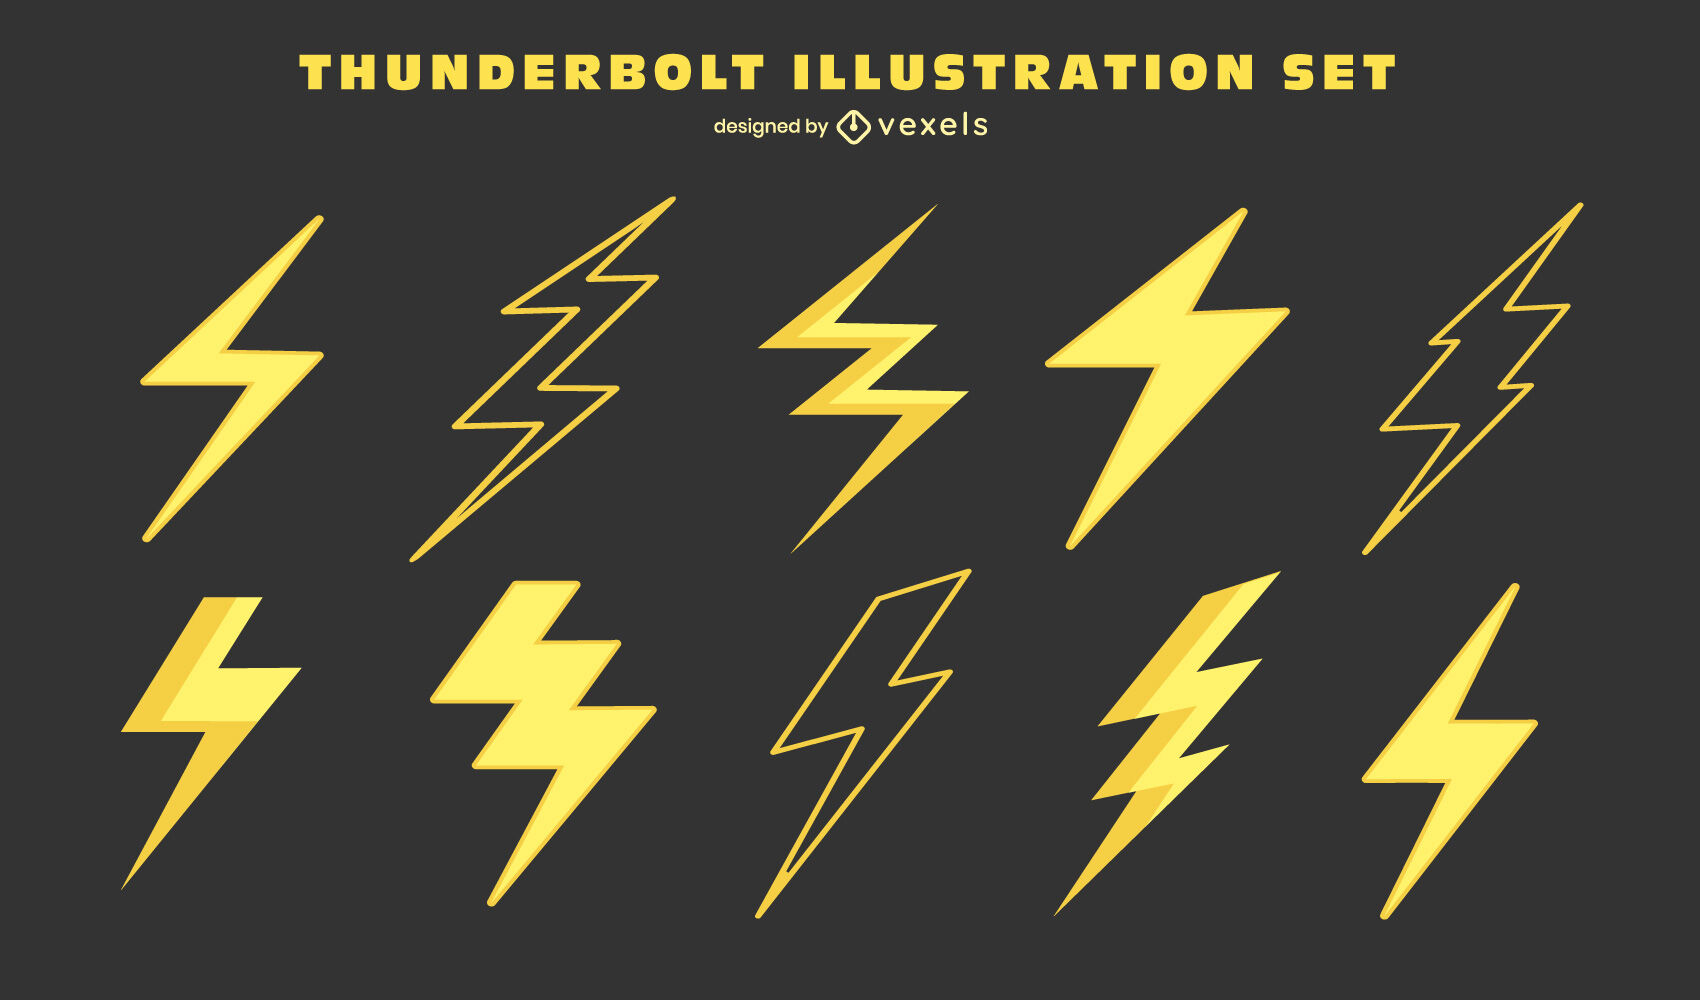 Lightning bolts thunderstorm weather set